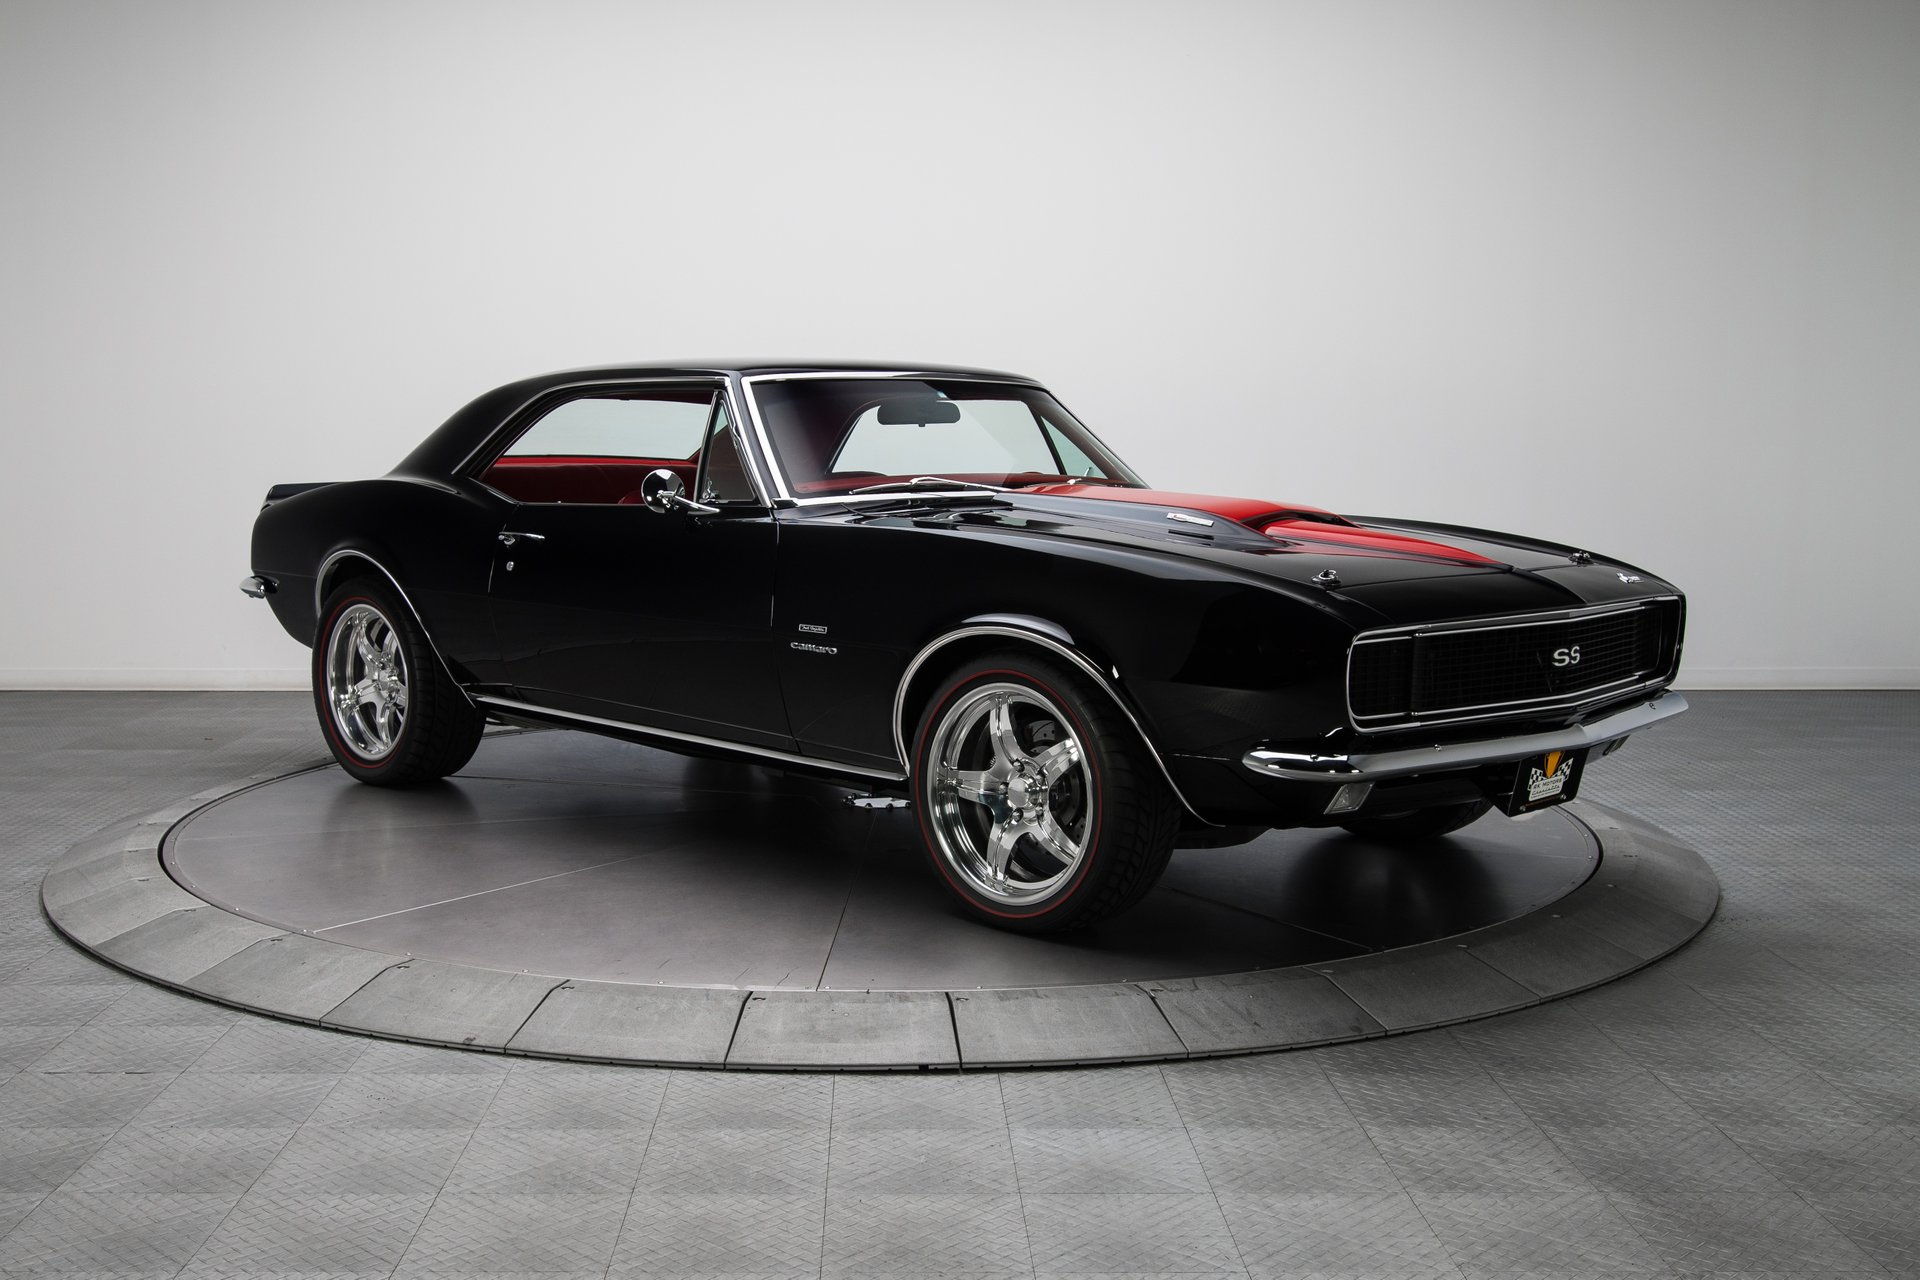 134896 1967 Chevrolet Camaro RK Motors Classic Cars for Sale